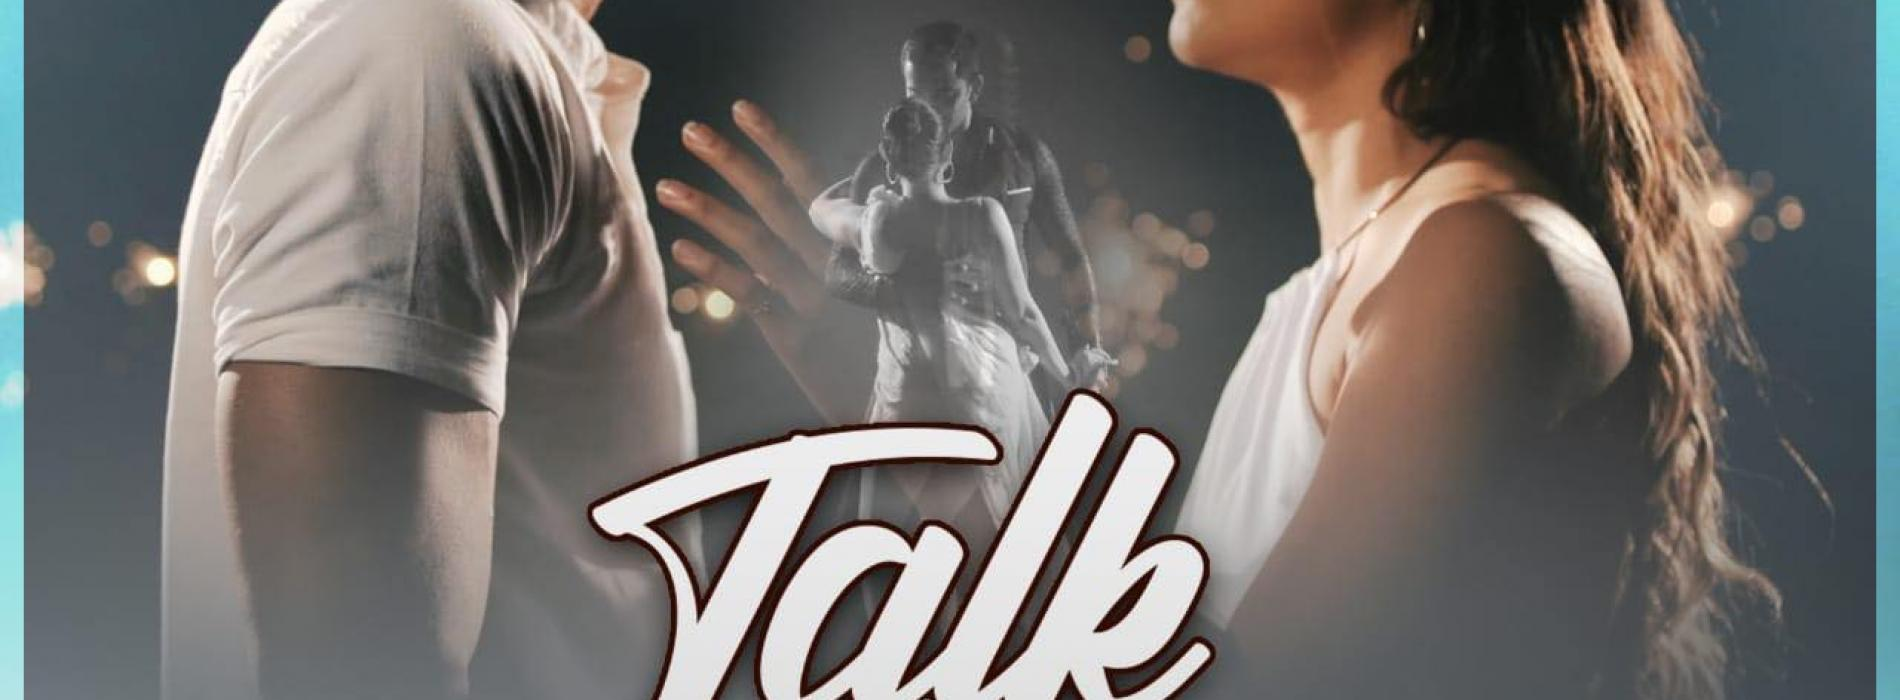 New Music : Talk Is Cheap (Good Groove Cover) – Romaine Willis ft Shaun Perera